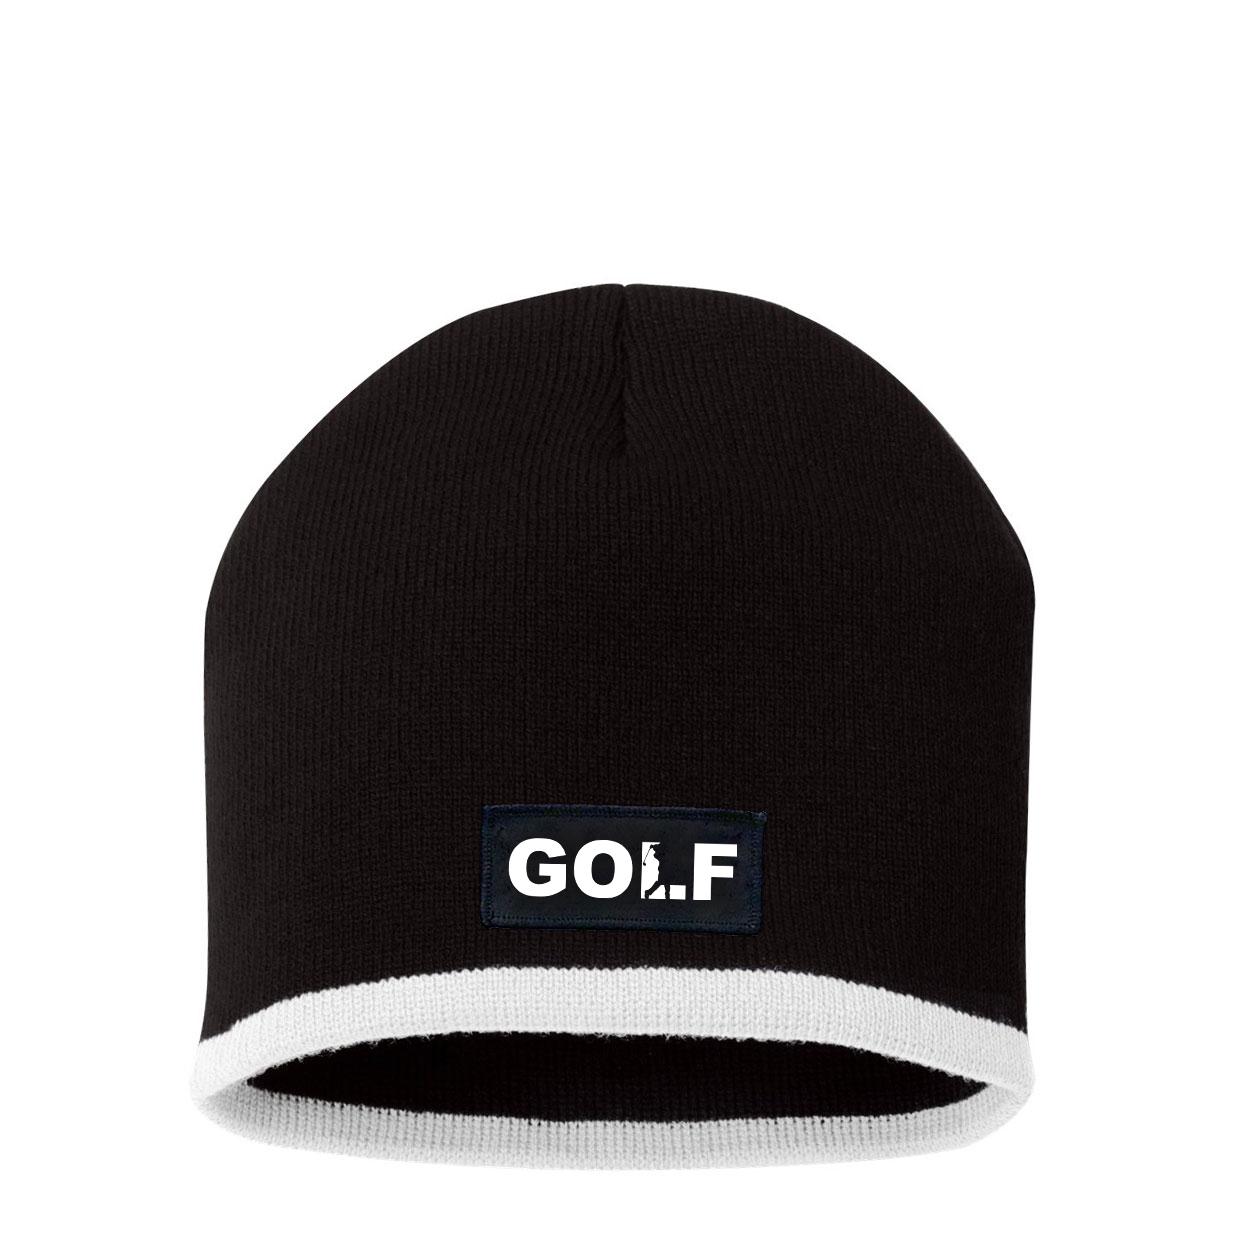 Golf Swing Logo Night Out Woven Patch Skully Beanie Black/White (White Logo)